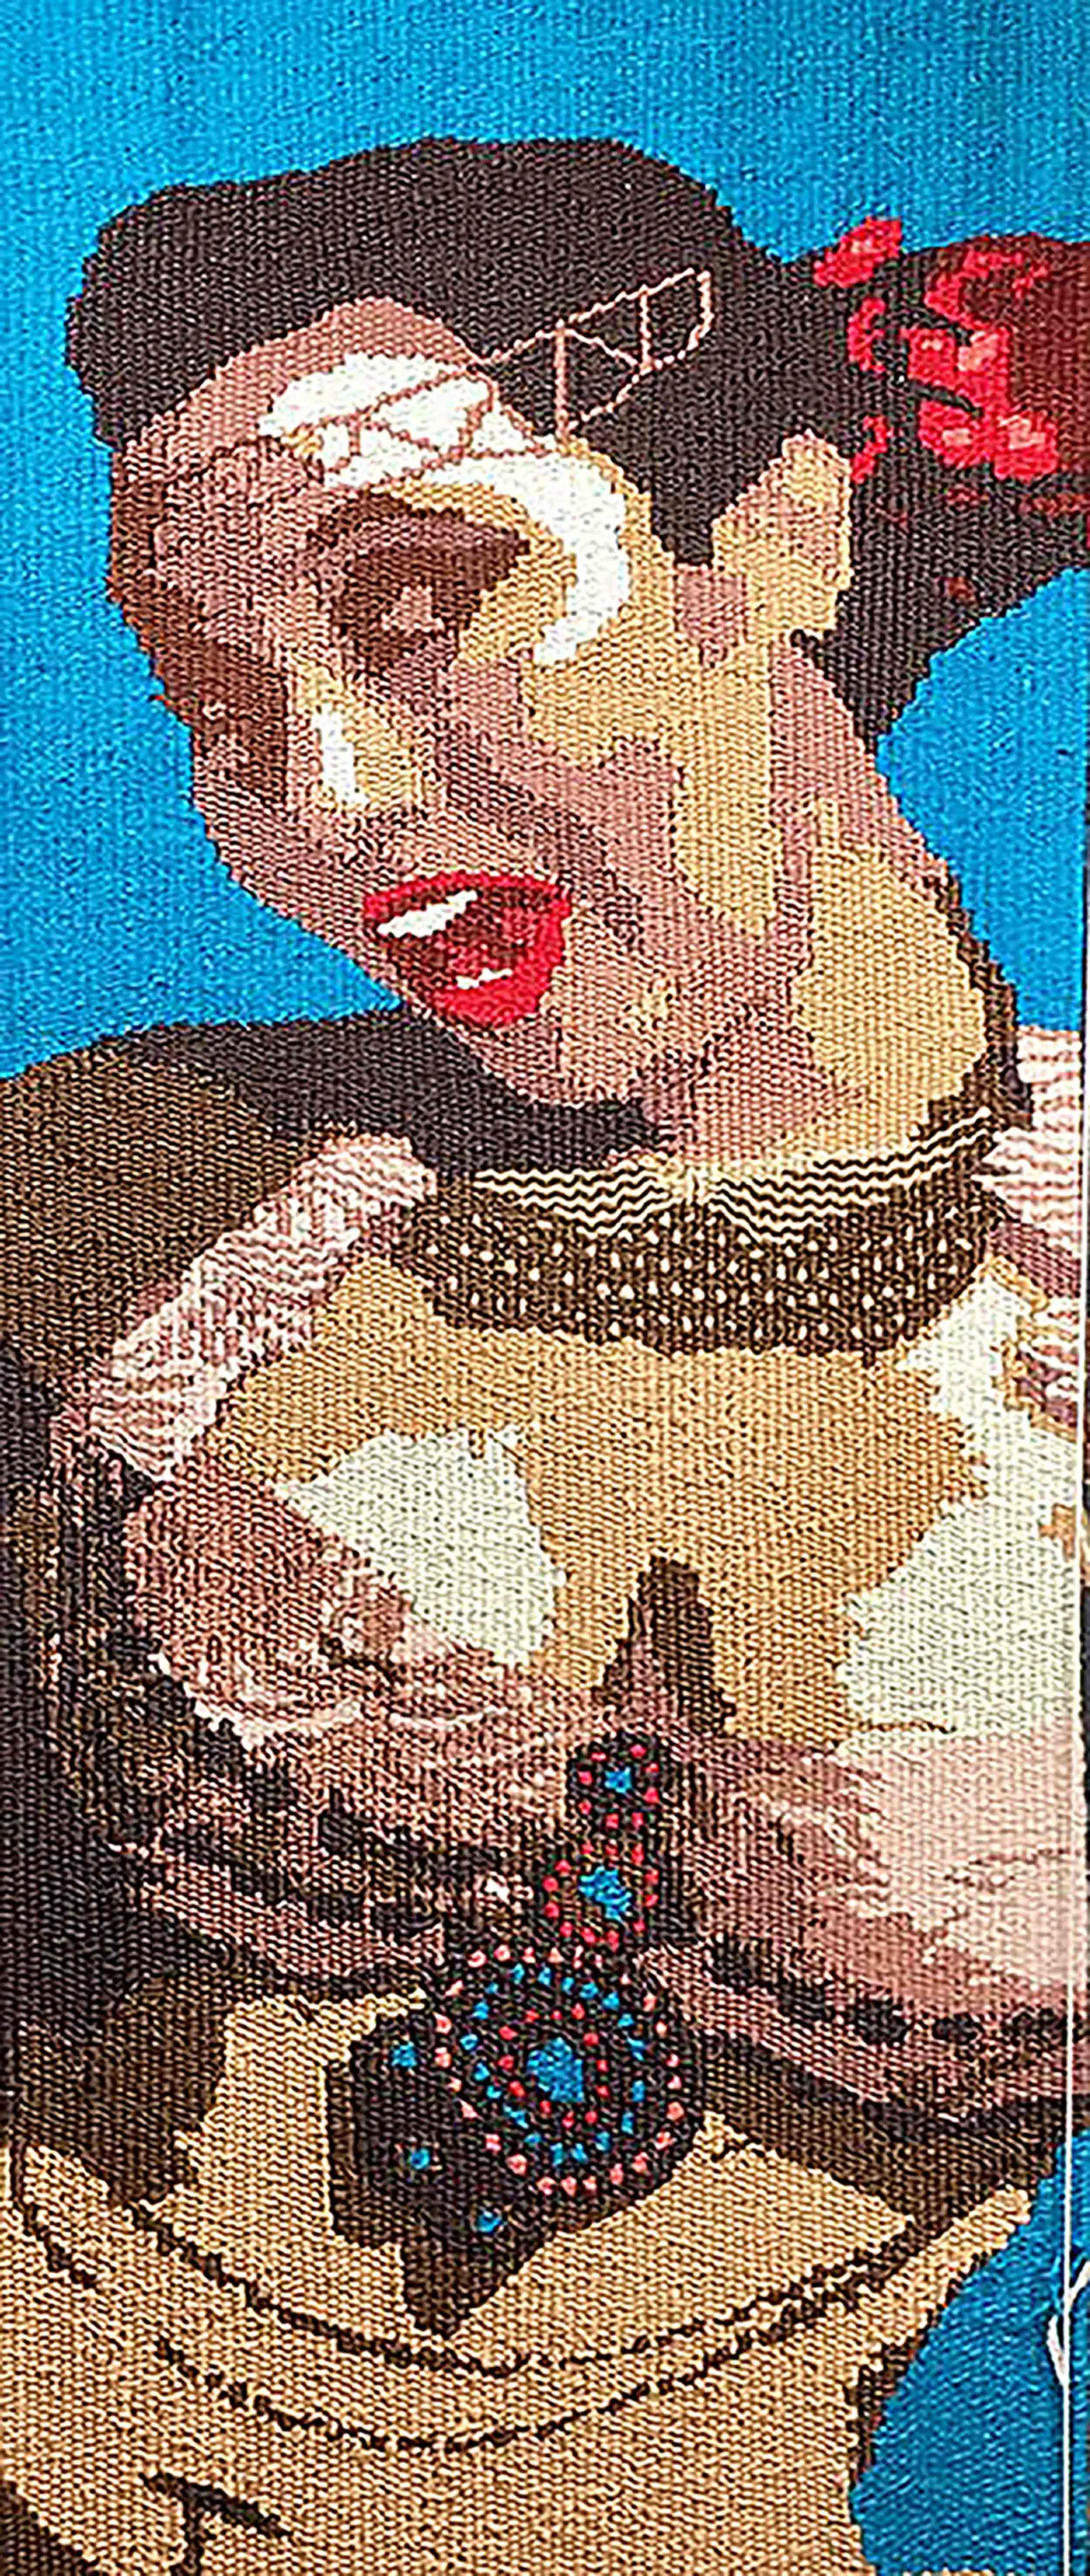 Untitled, Barbara Burns